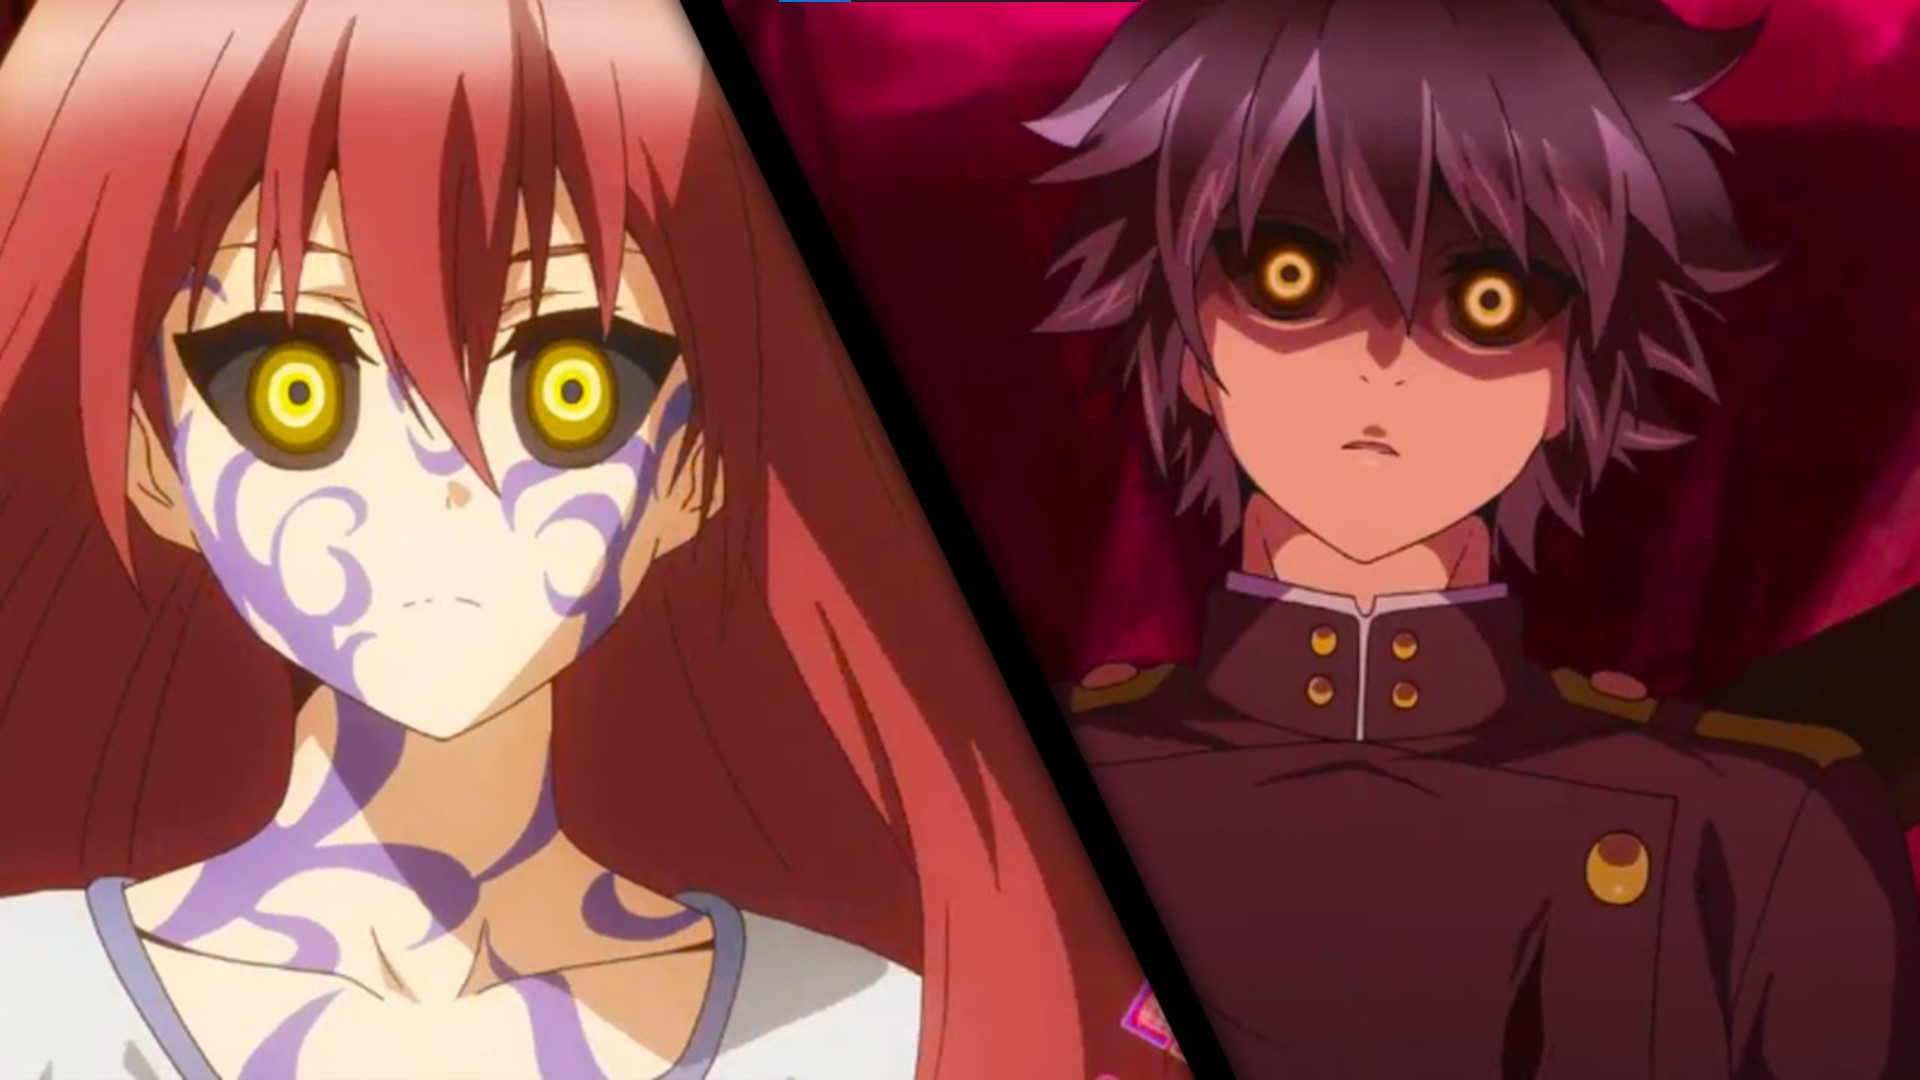 Seraph of the End- anime like black clover/anime similar to black clover